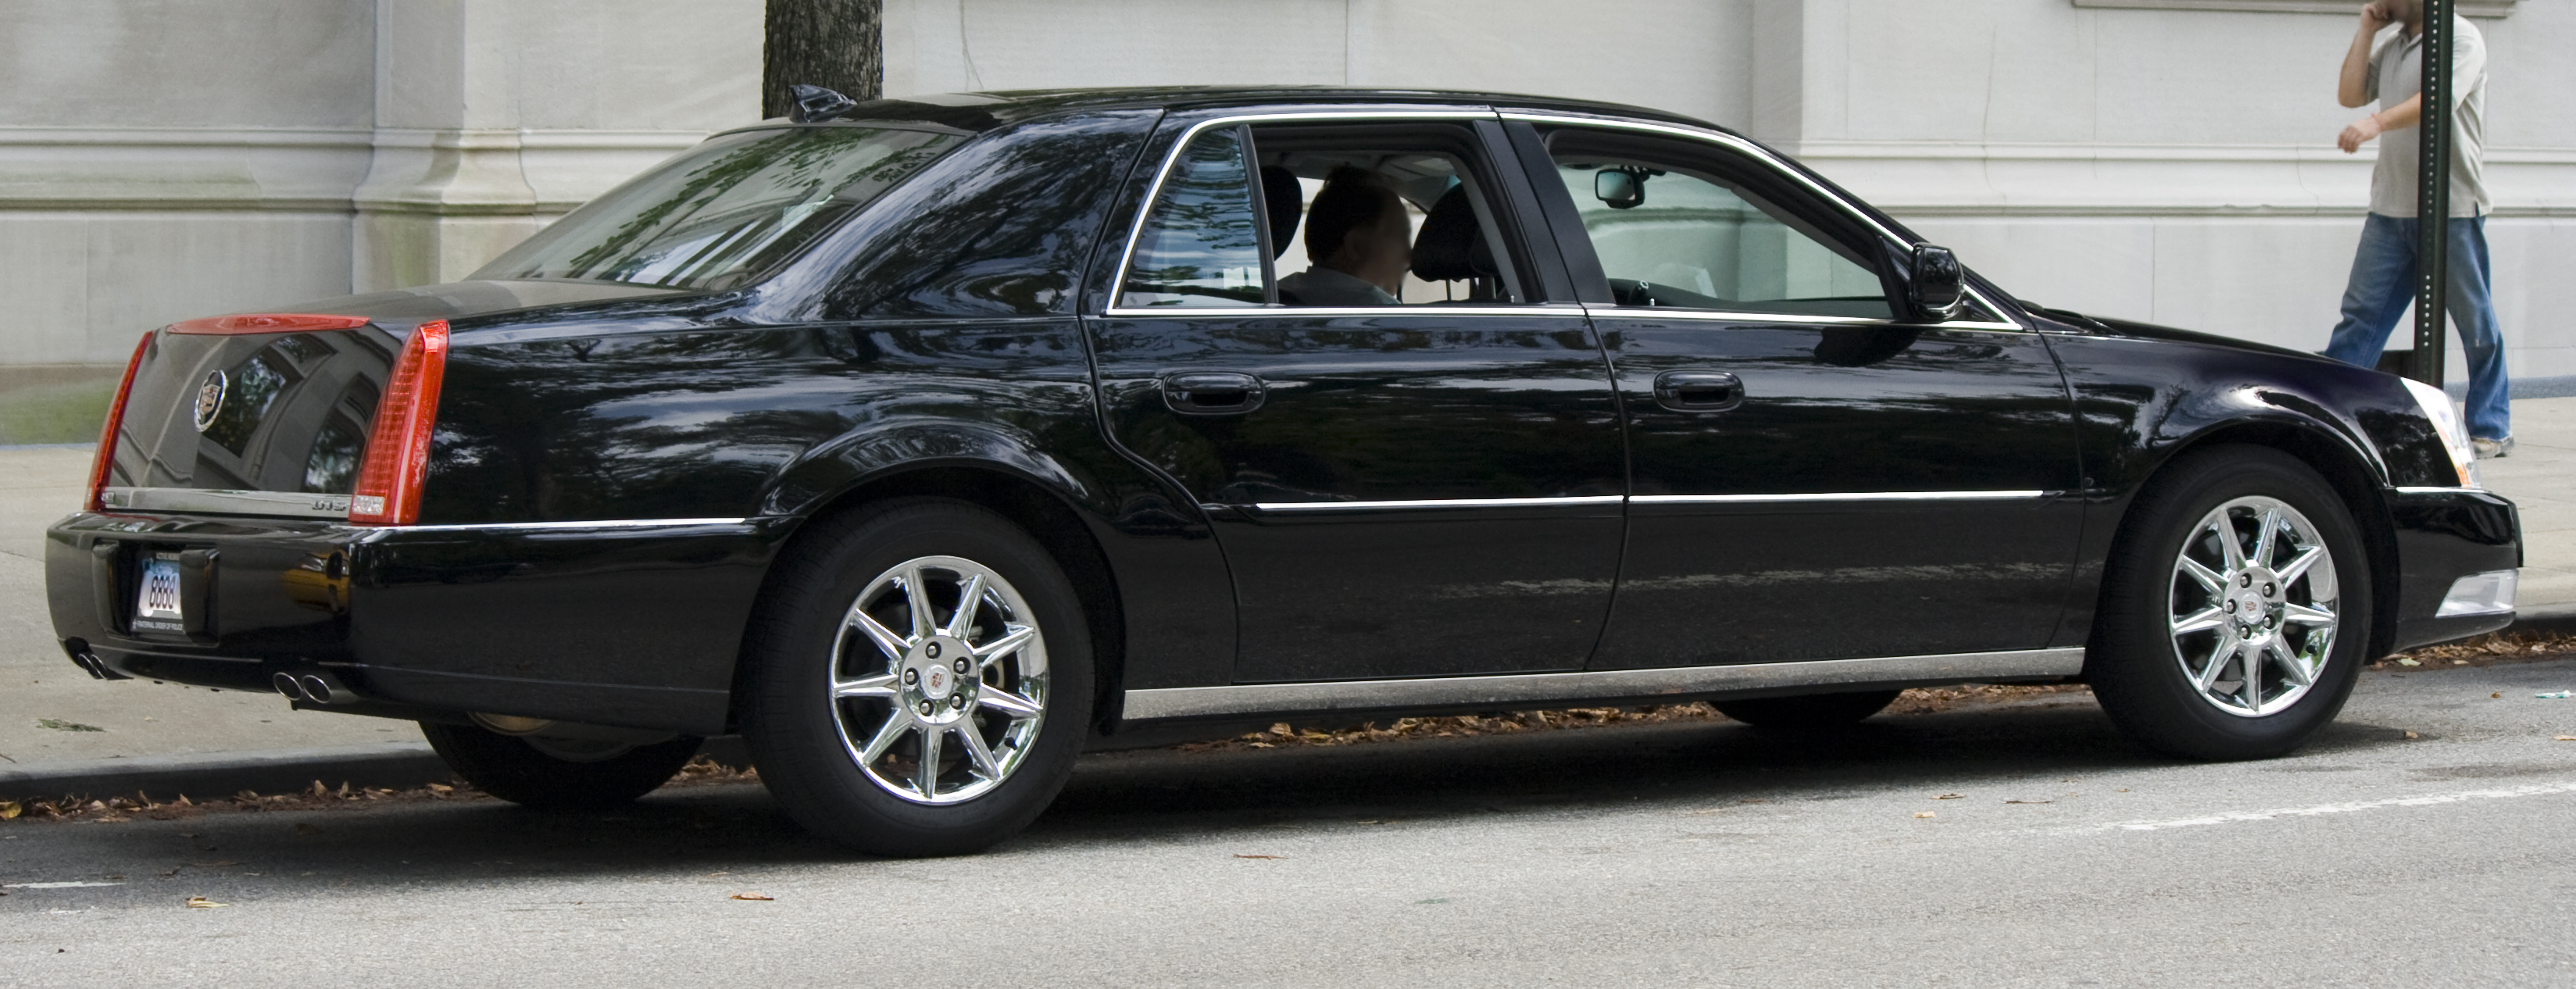 cars cadillac specs autoevolution dts